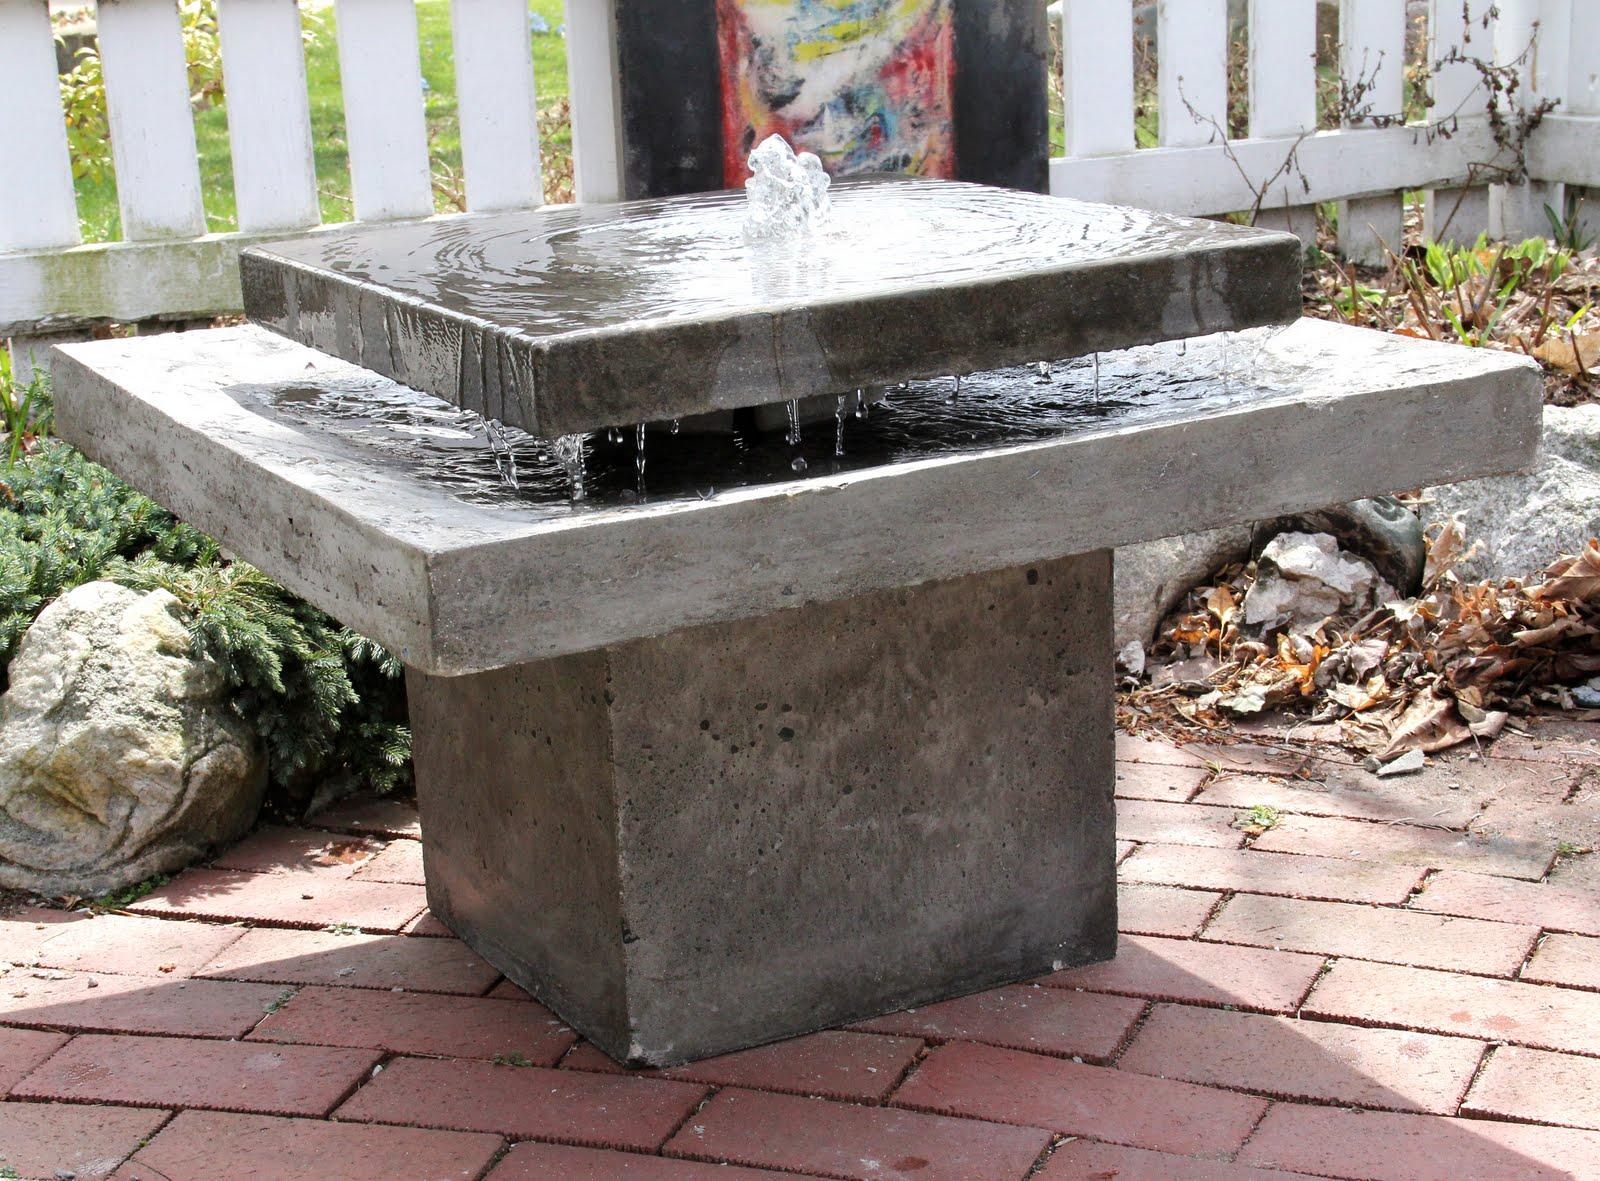 art studio: My new 2011 Concrete Water Fountain!